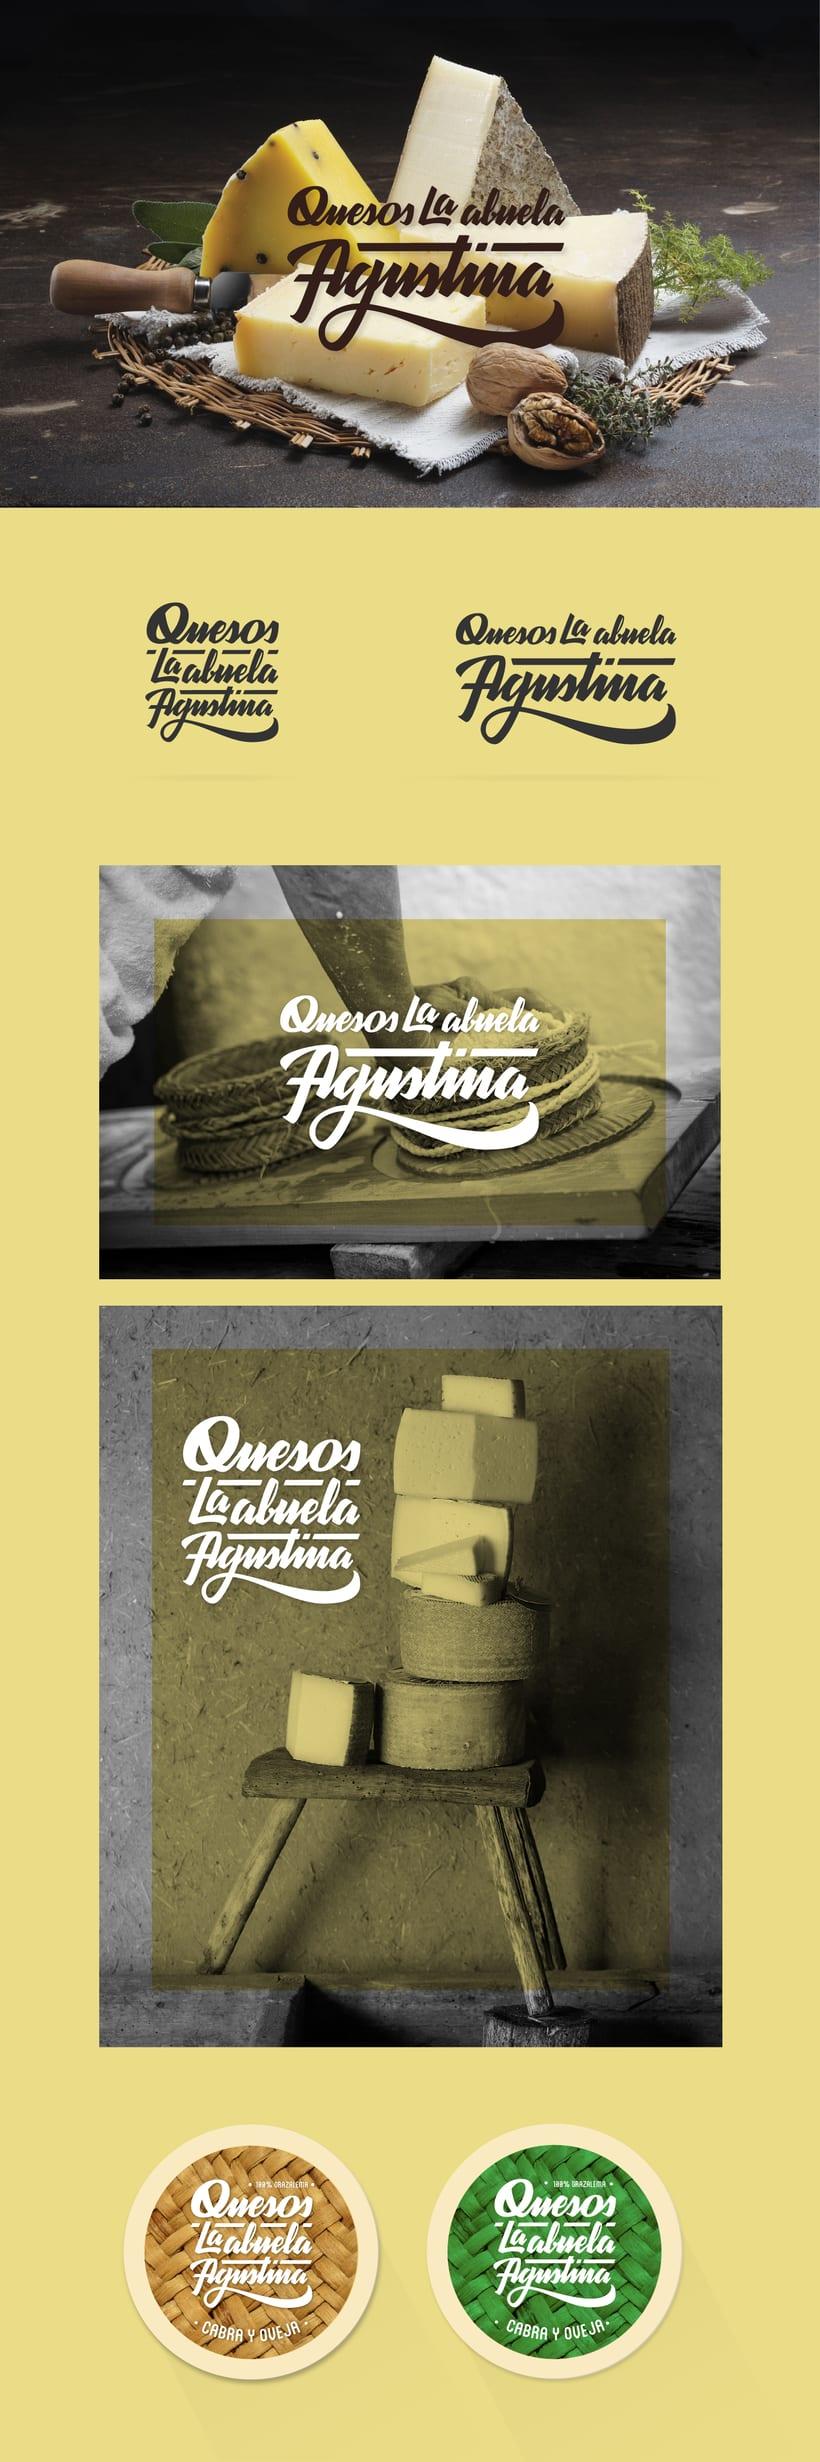 Quesos La Abuela Agustina · Logotipo -1